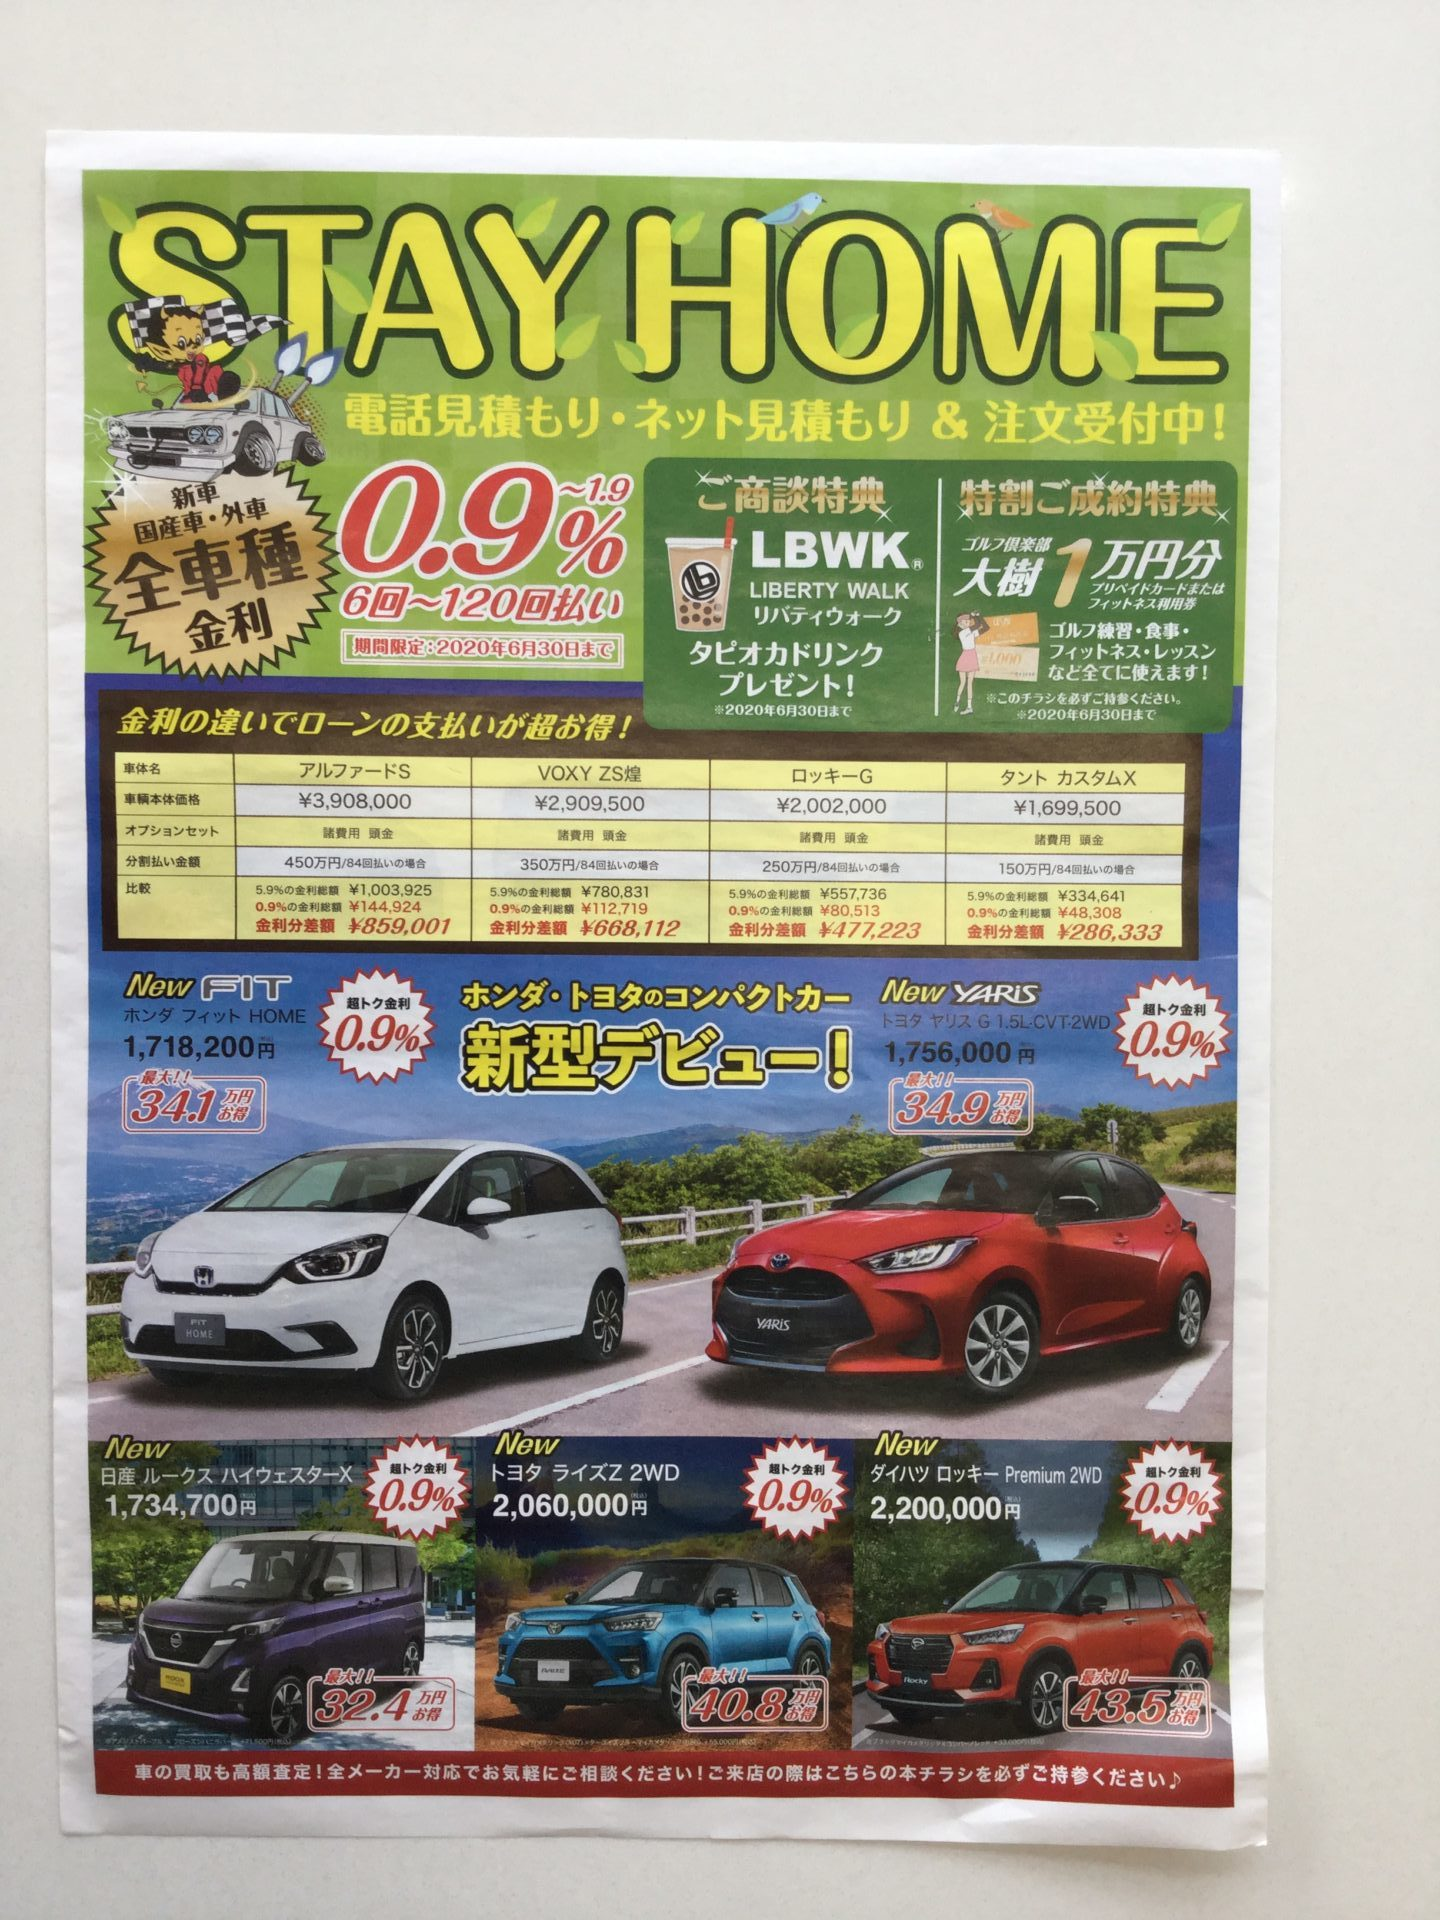 STAY HOME で車を購入!